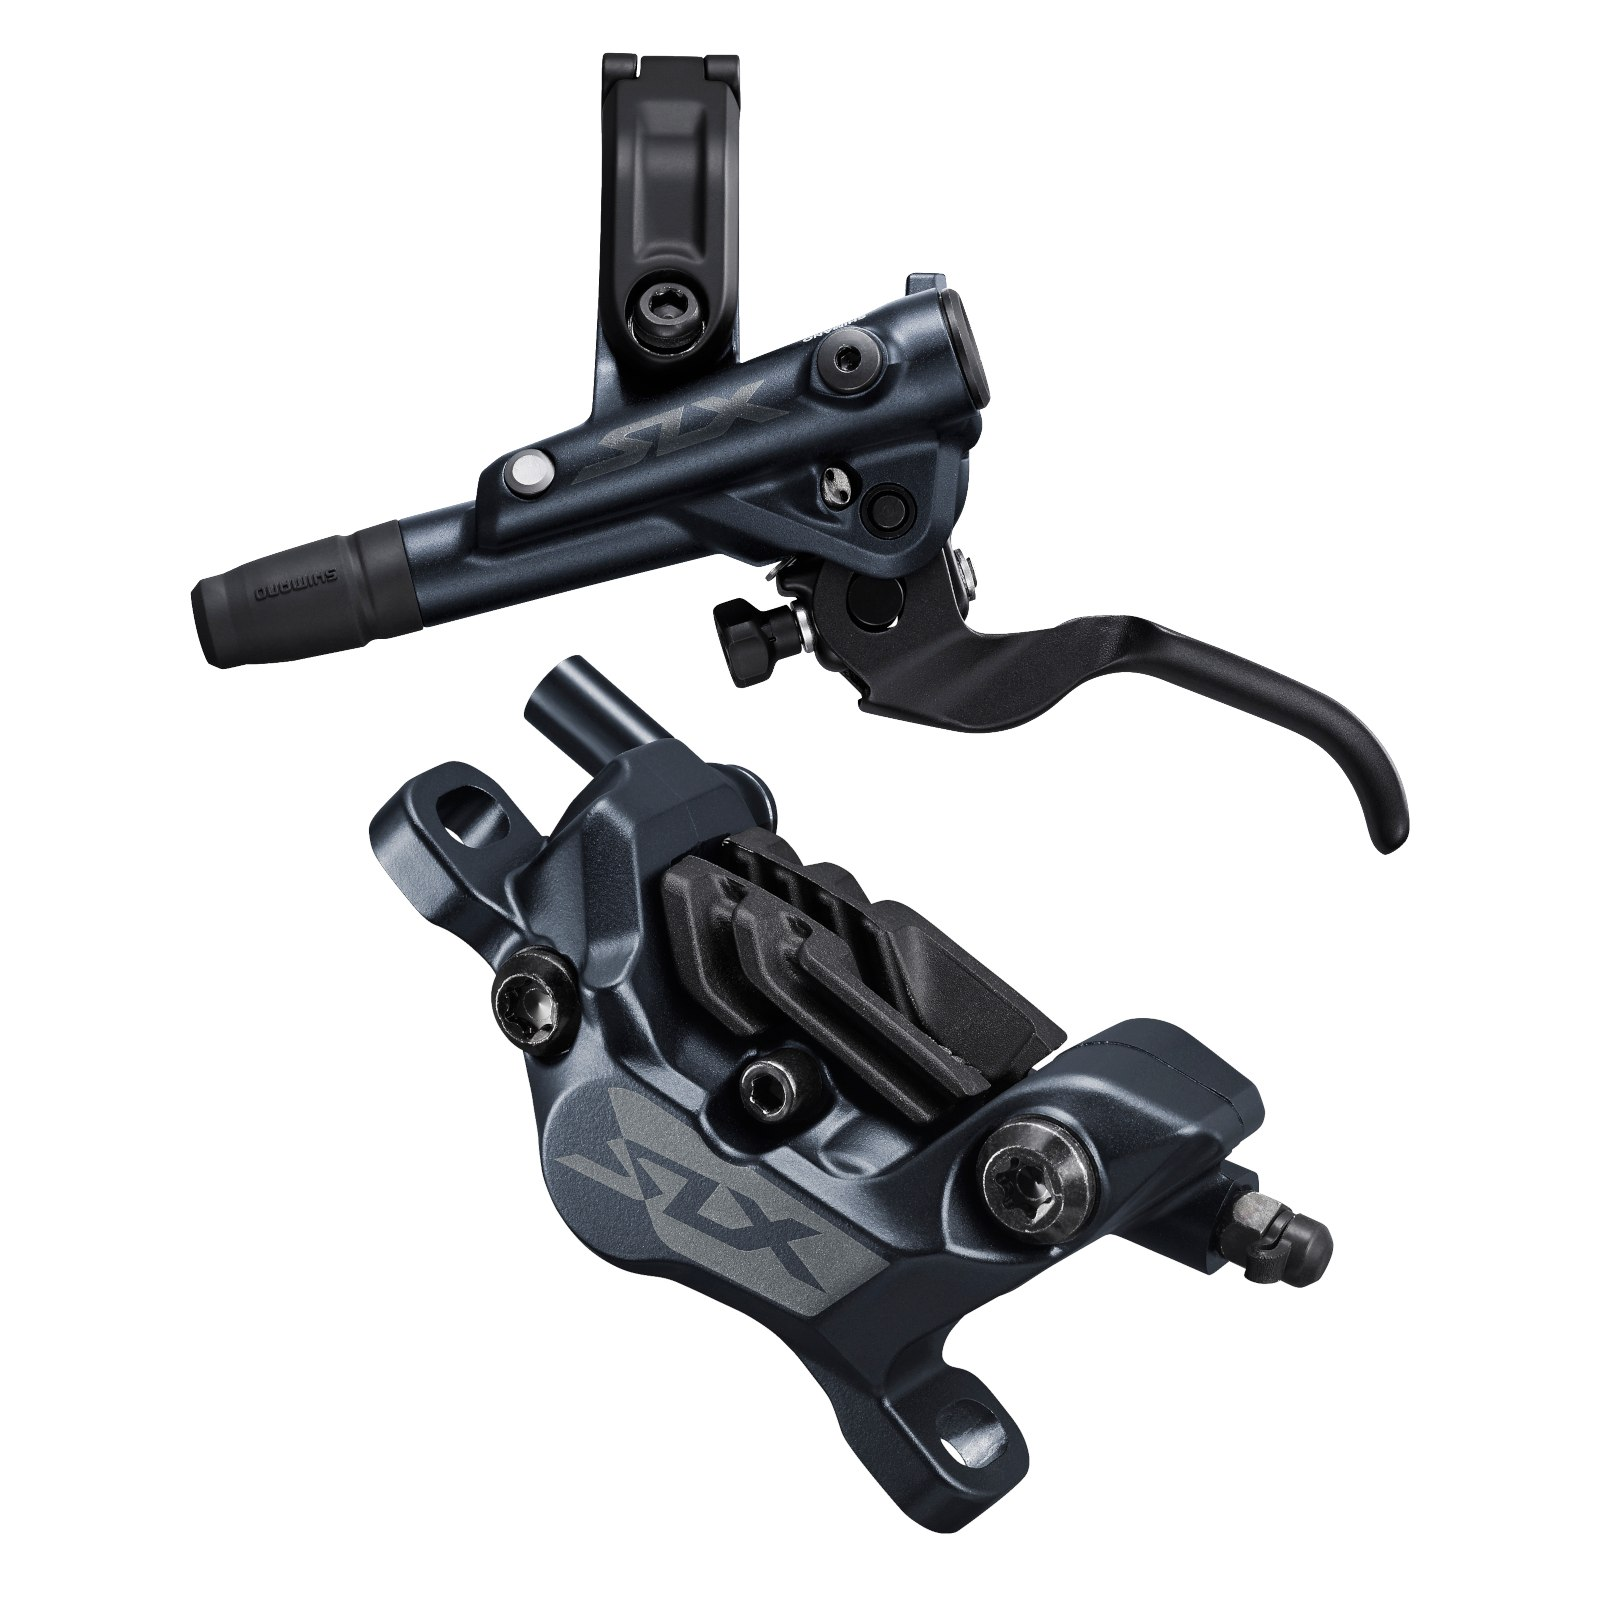 Shimano SLX BL-M7100 + BR-M7120 Enduro / Trail Hydraulic Disc Brake - I-Spec EV - J-Kit - Set FW